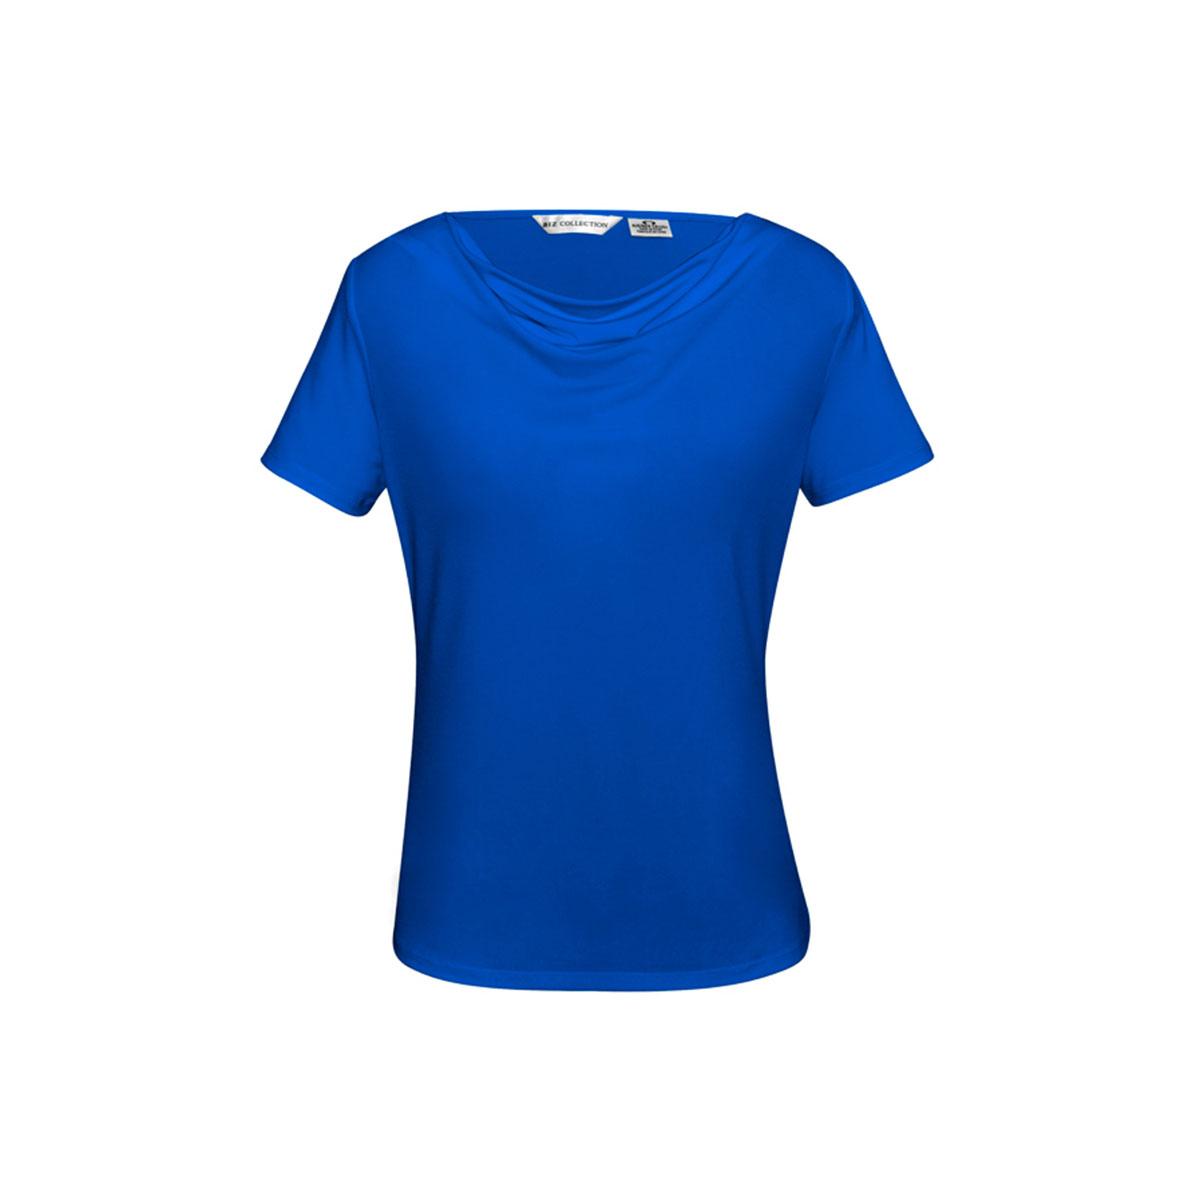 Ladies Ava Drape Knit Top-Electric Blue